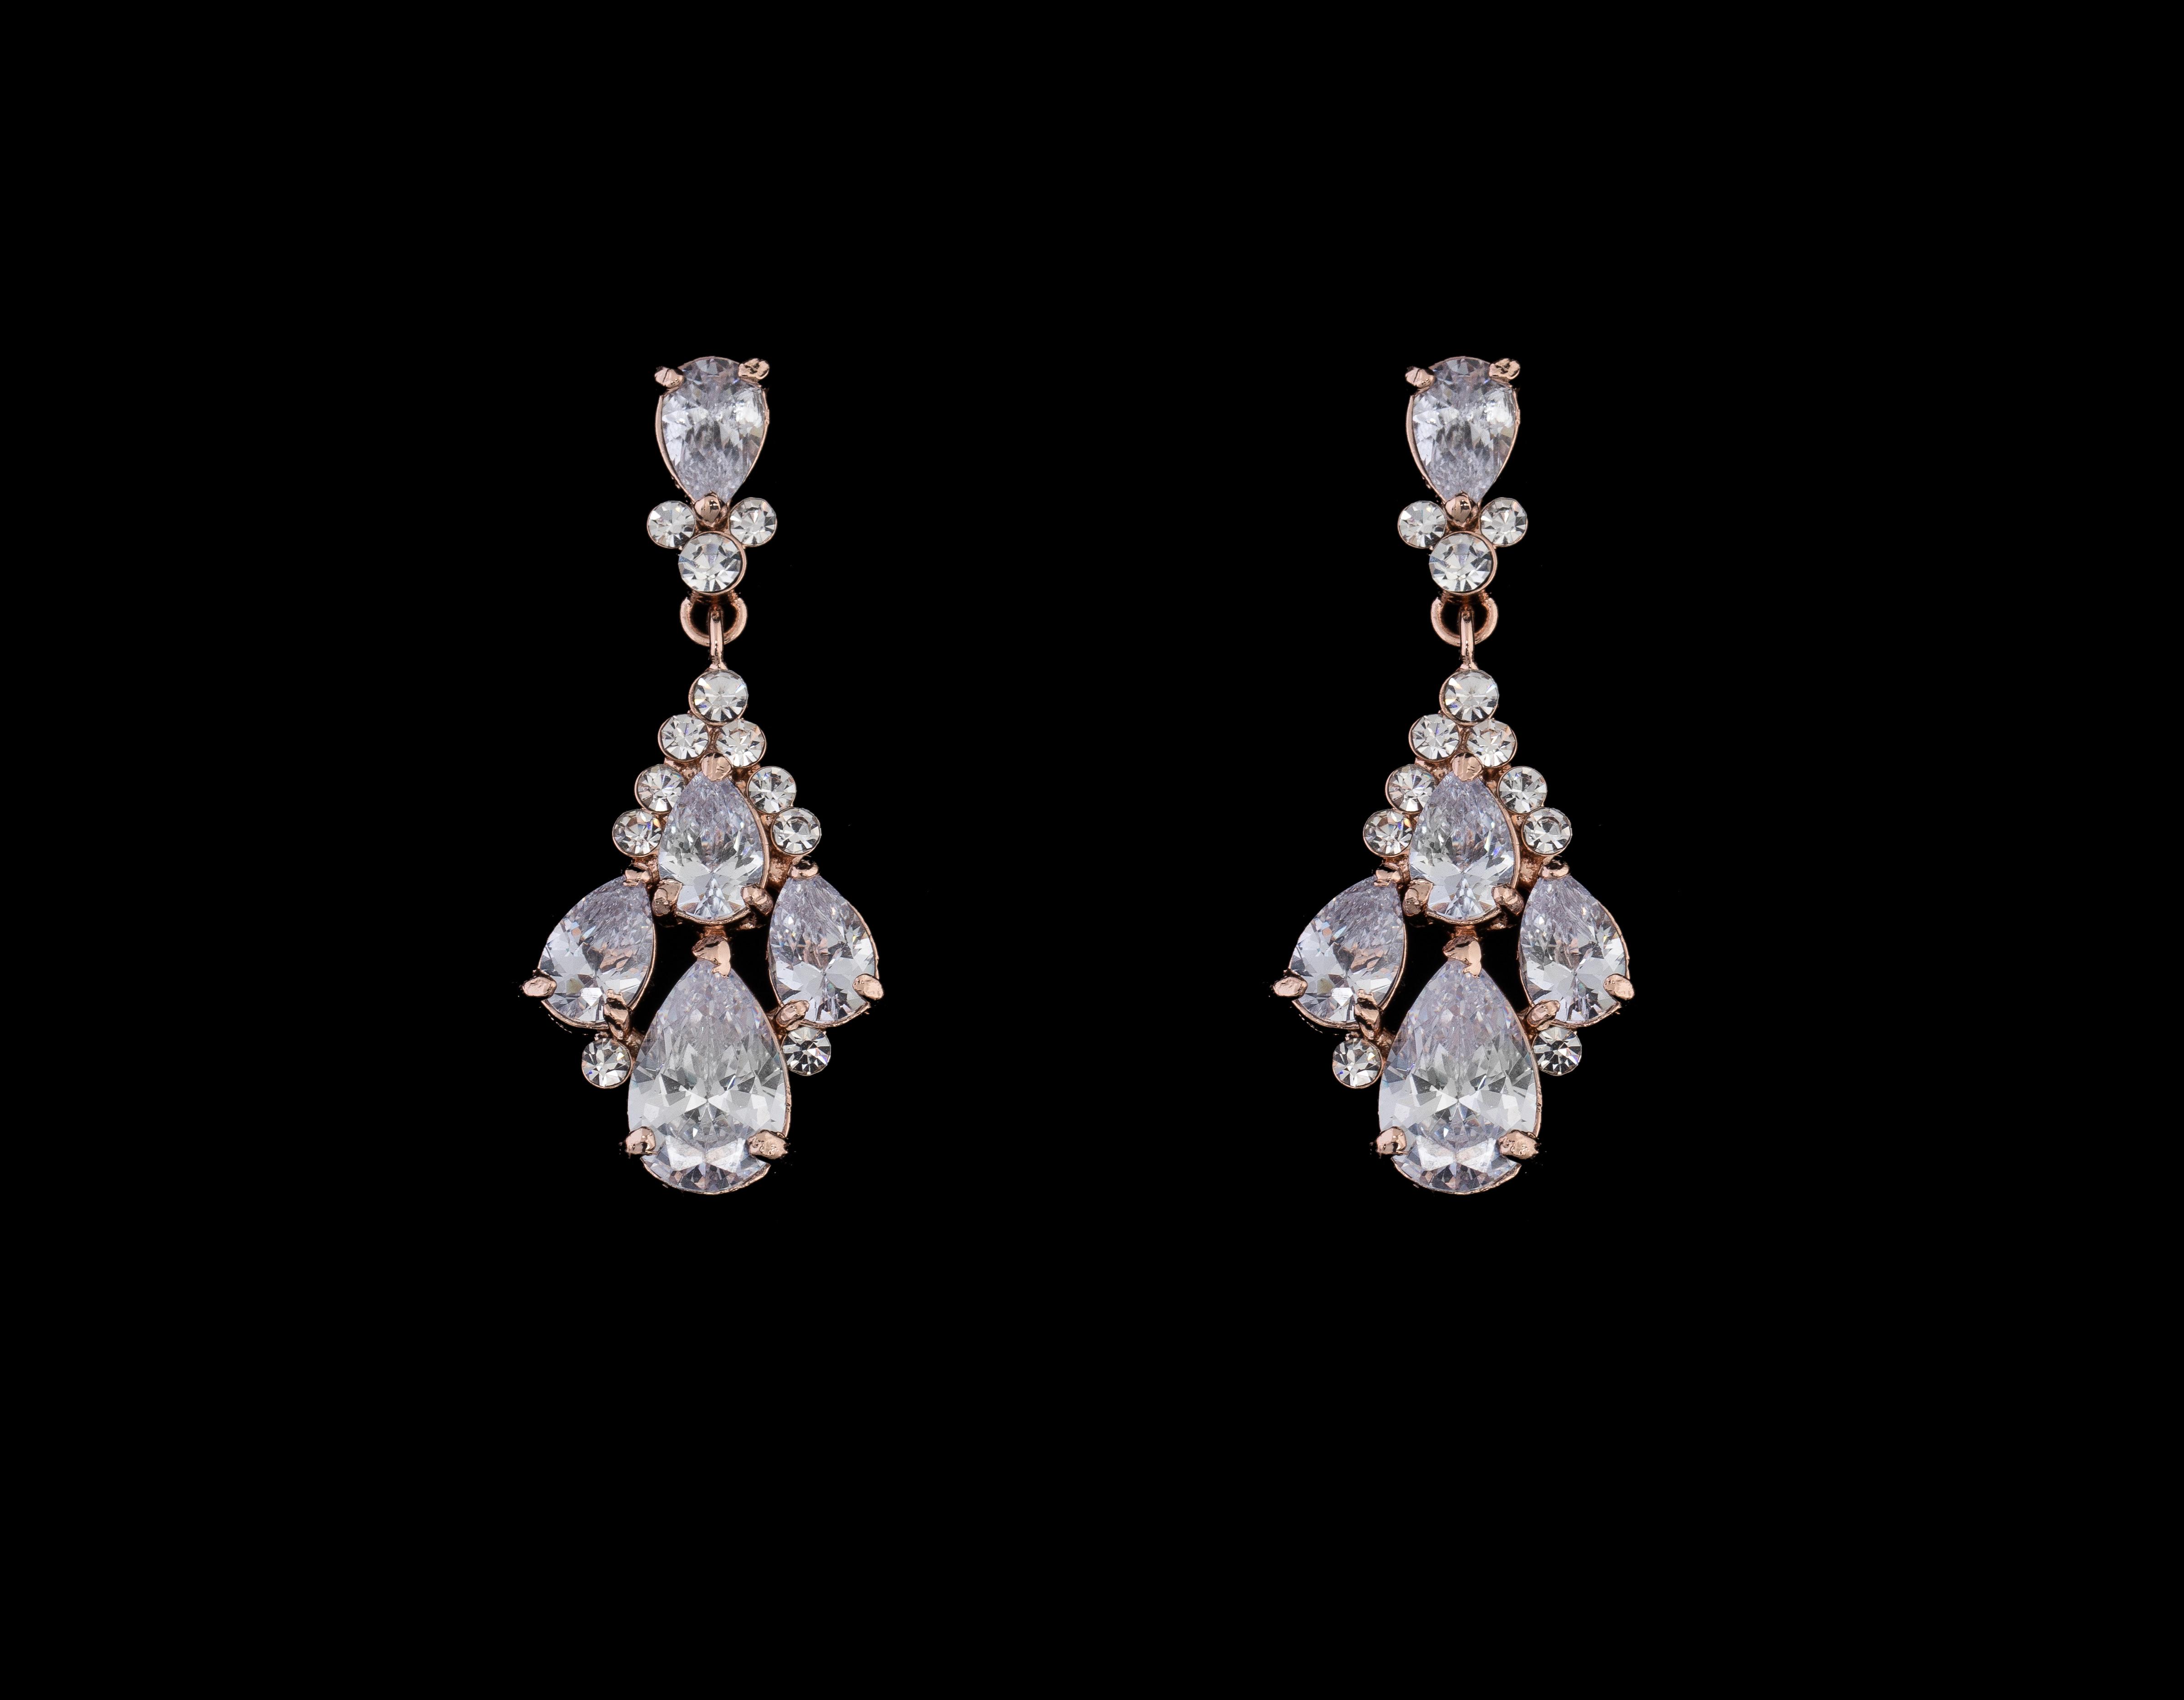 Bridal Classics Earrings MJ-293